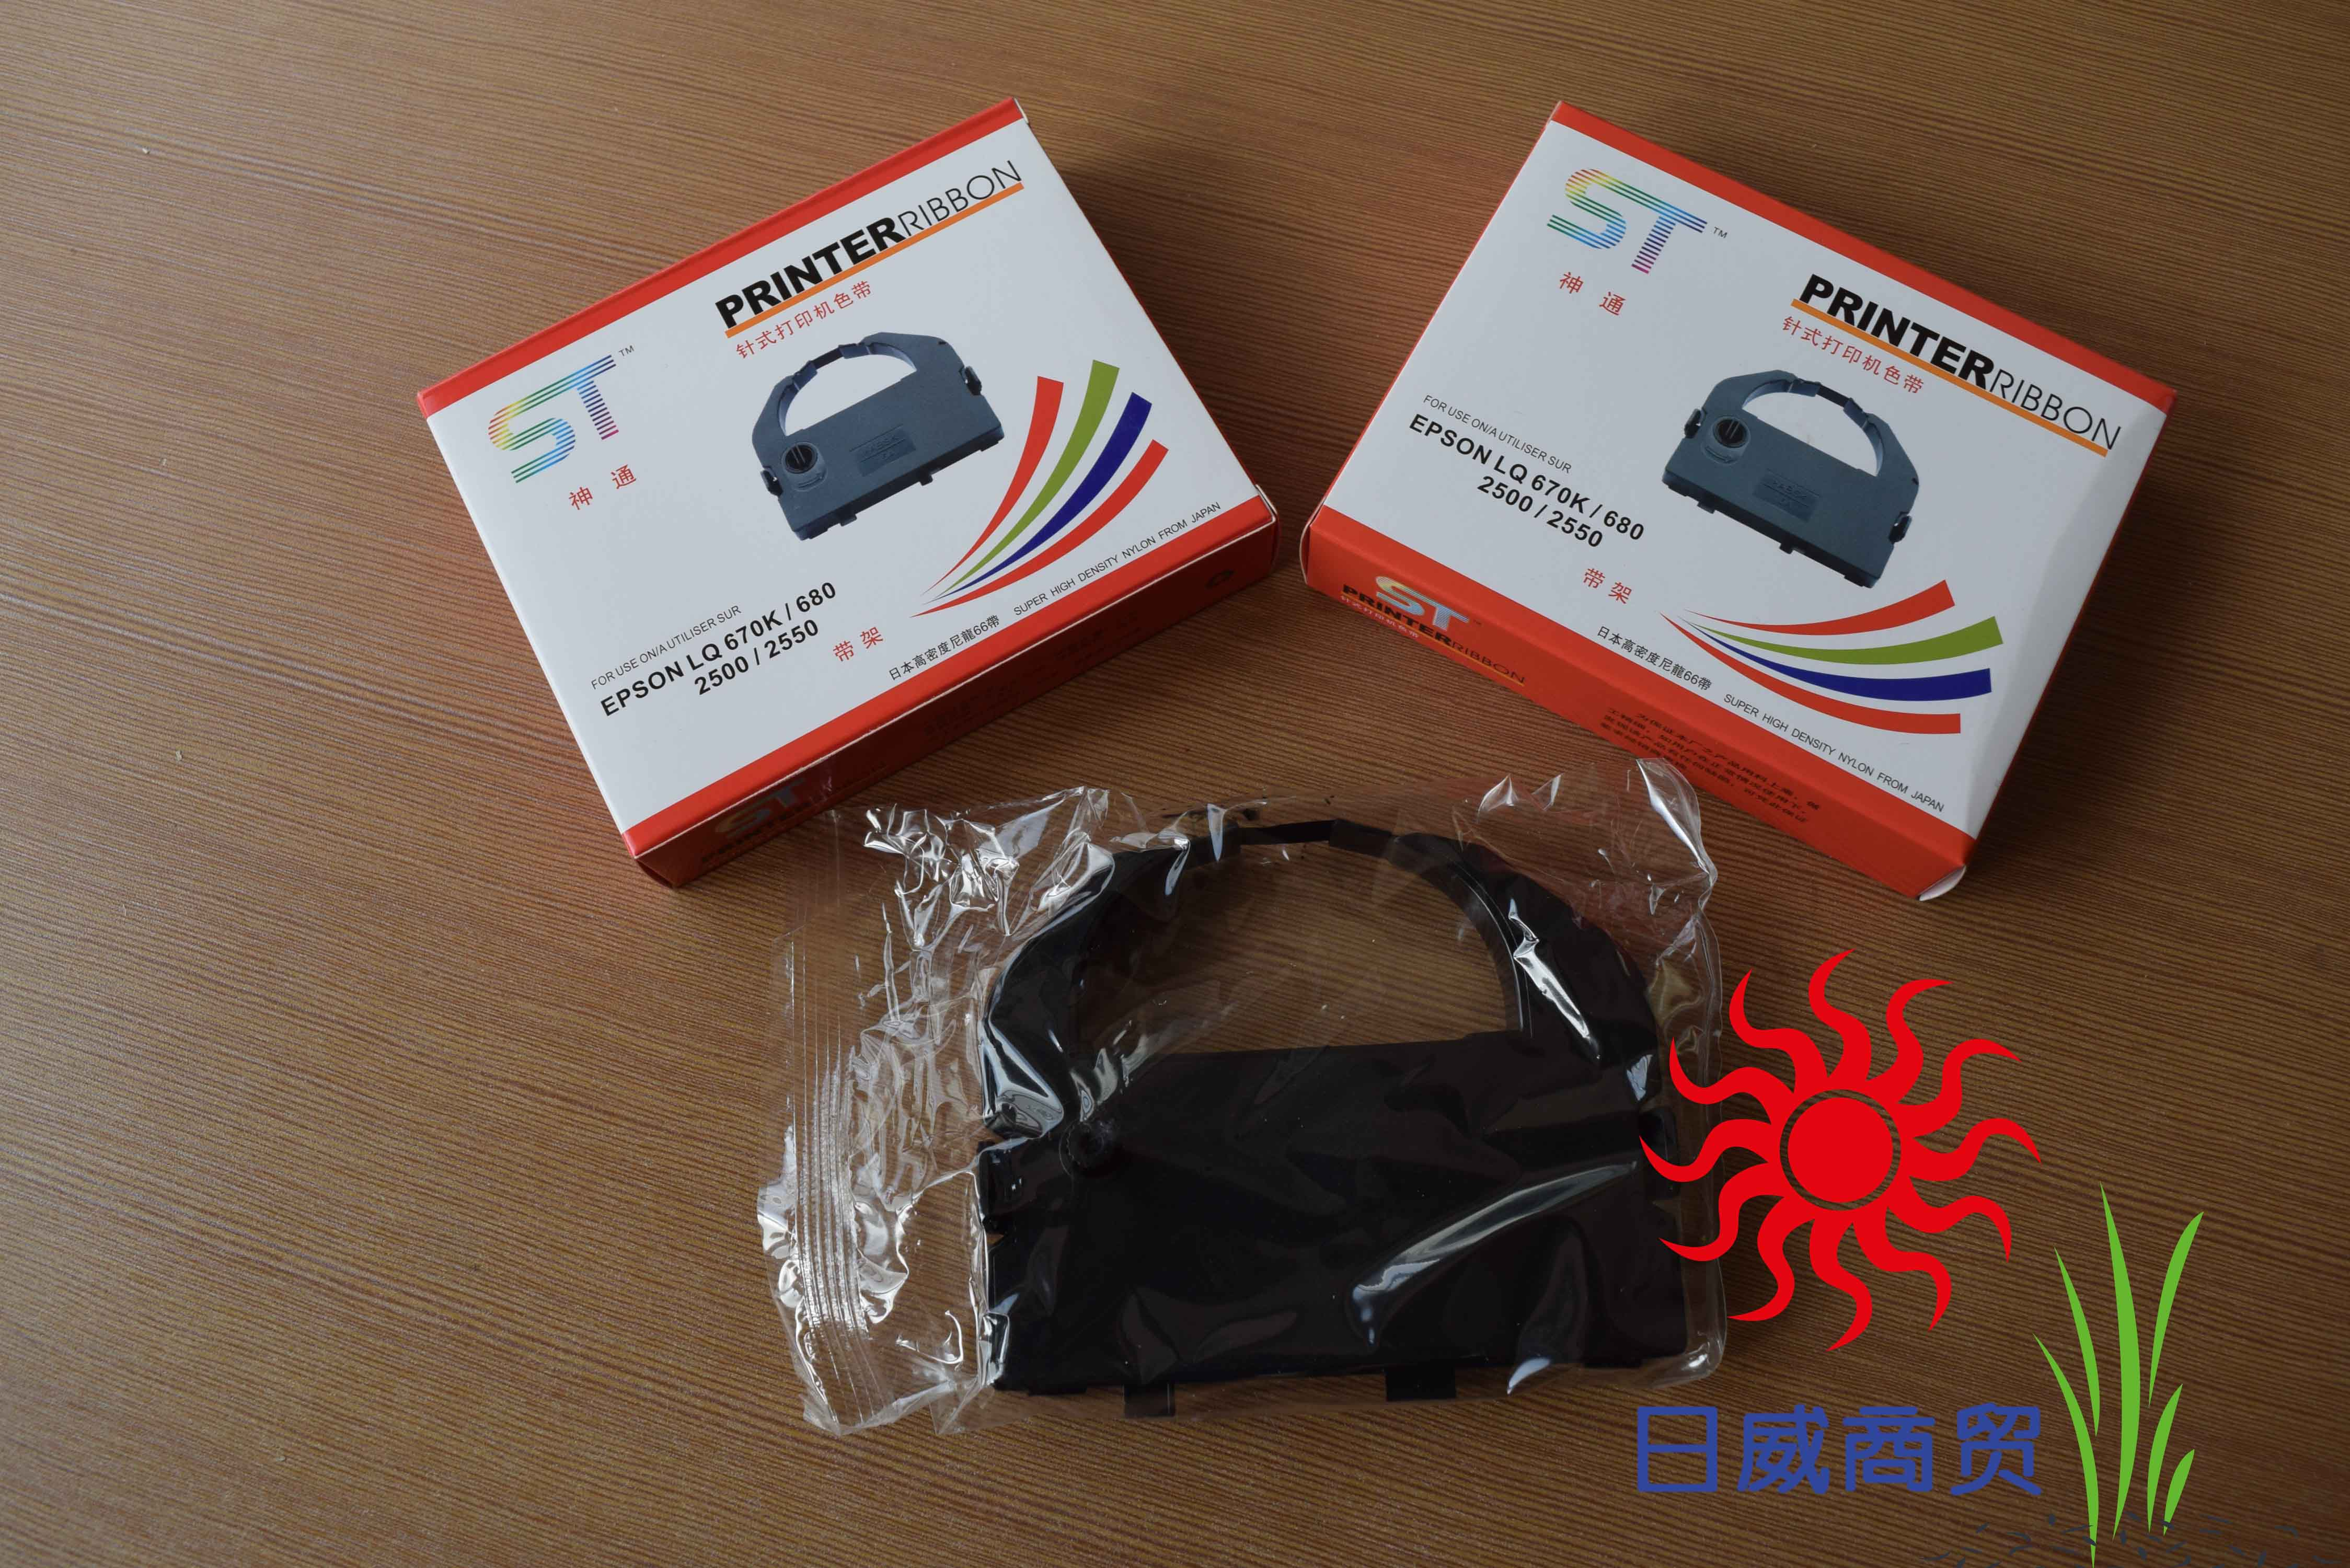 ST-神通LQ670K色带架/适用于爱普生660k/670K/680K/2550/KP770